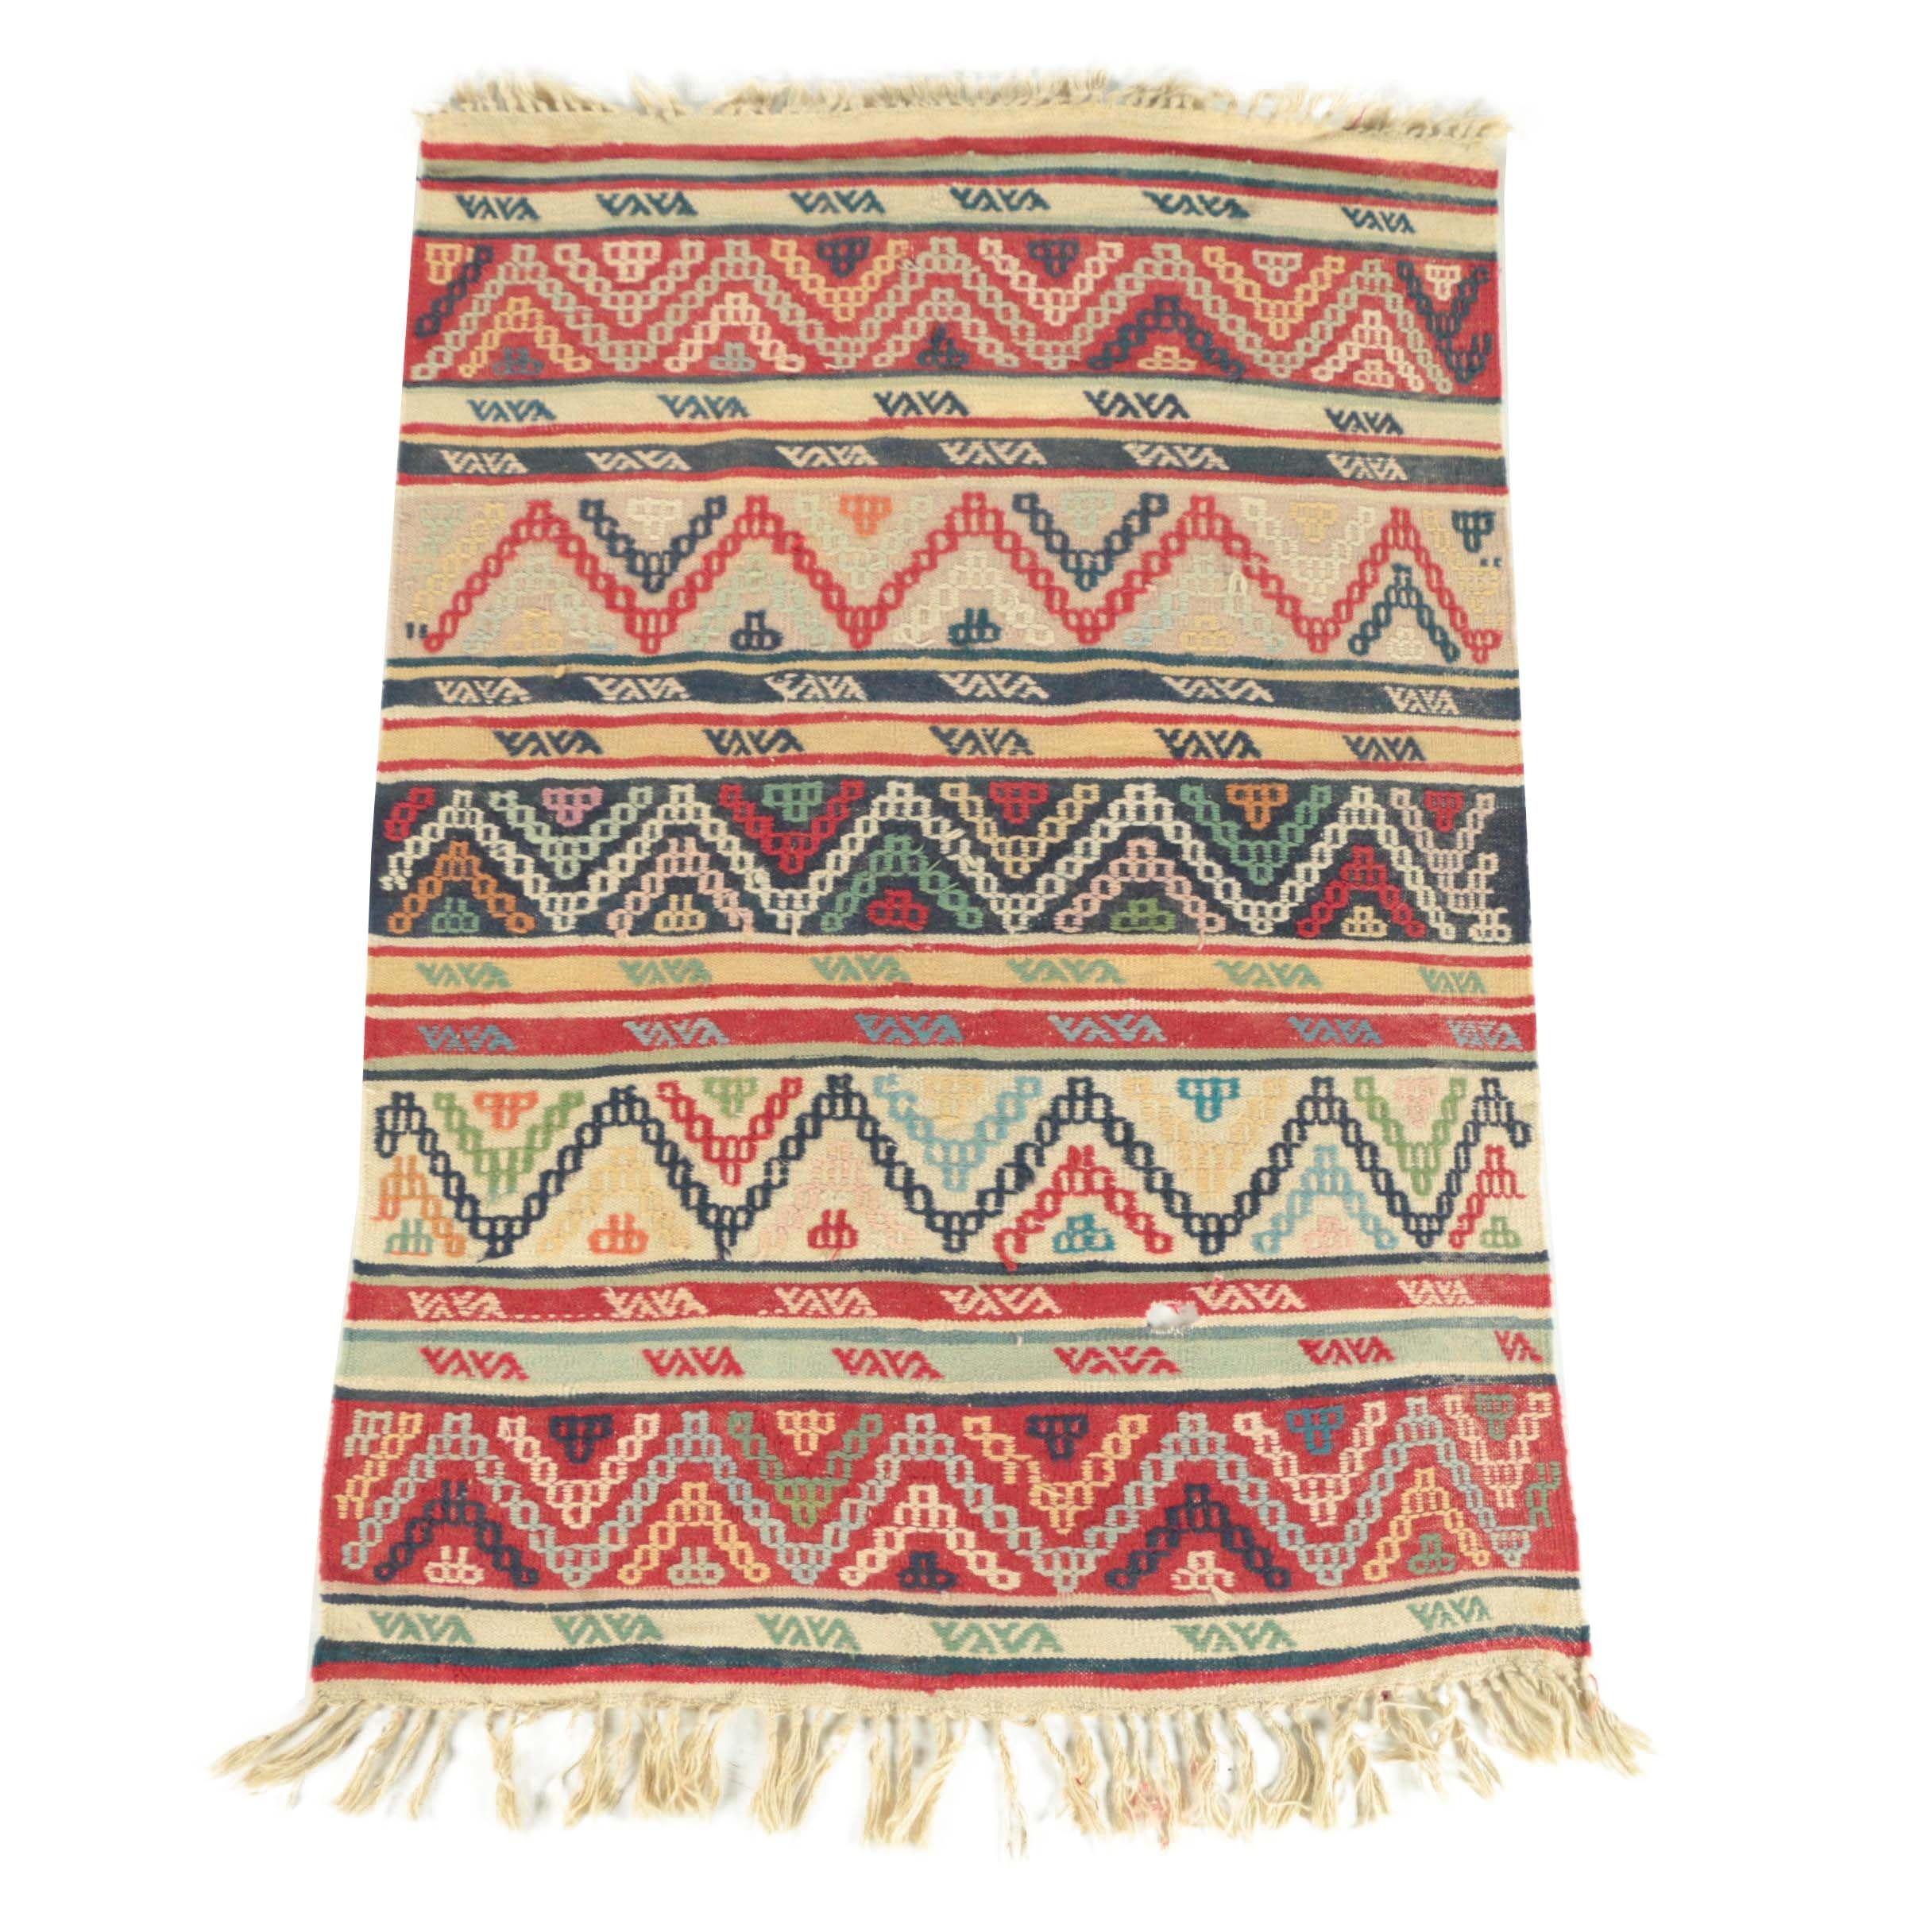 Handwoven Moroccan Zemmour Wool Kilim